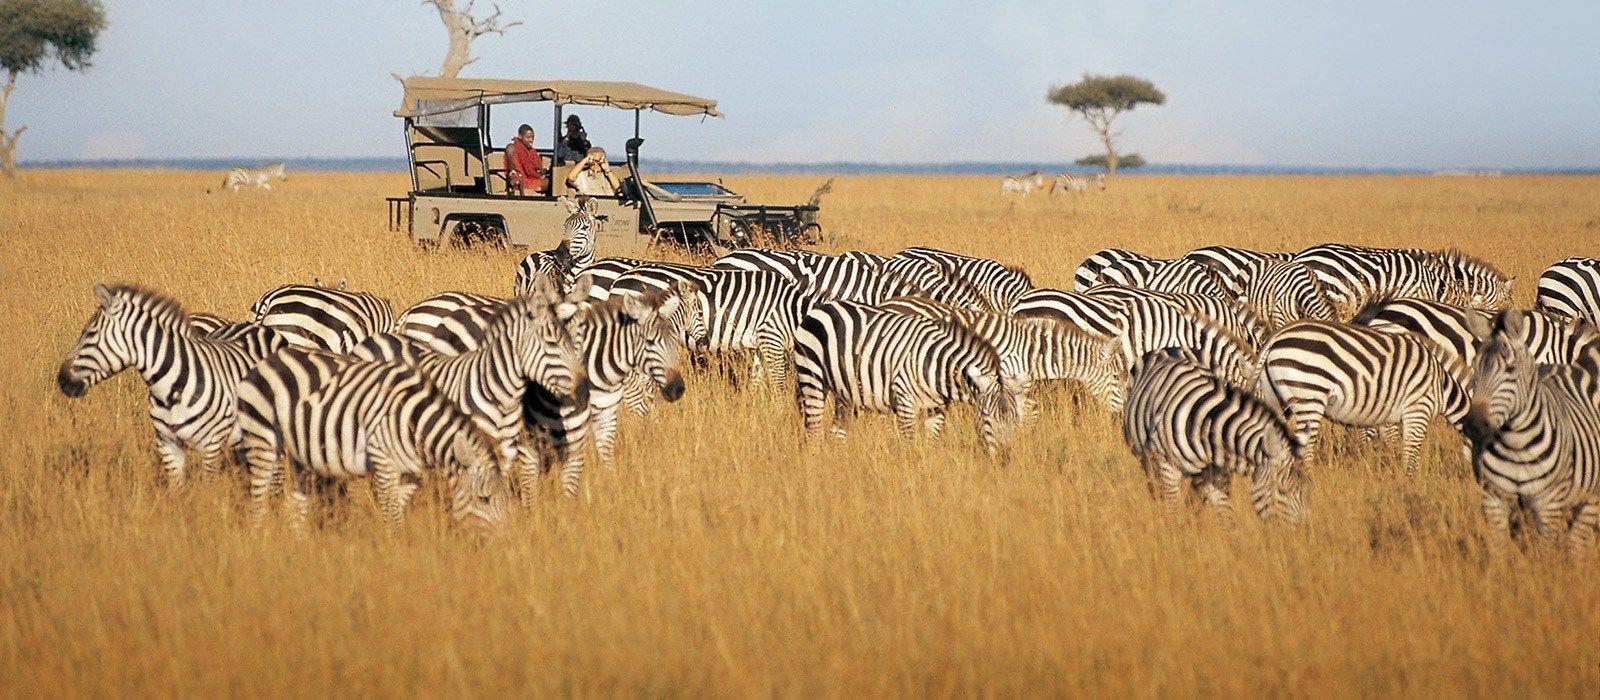 Kenya Safari and Zanzibar Tour Trip 2